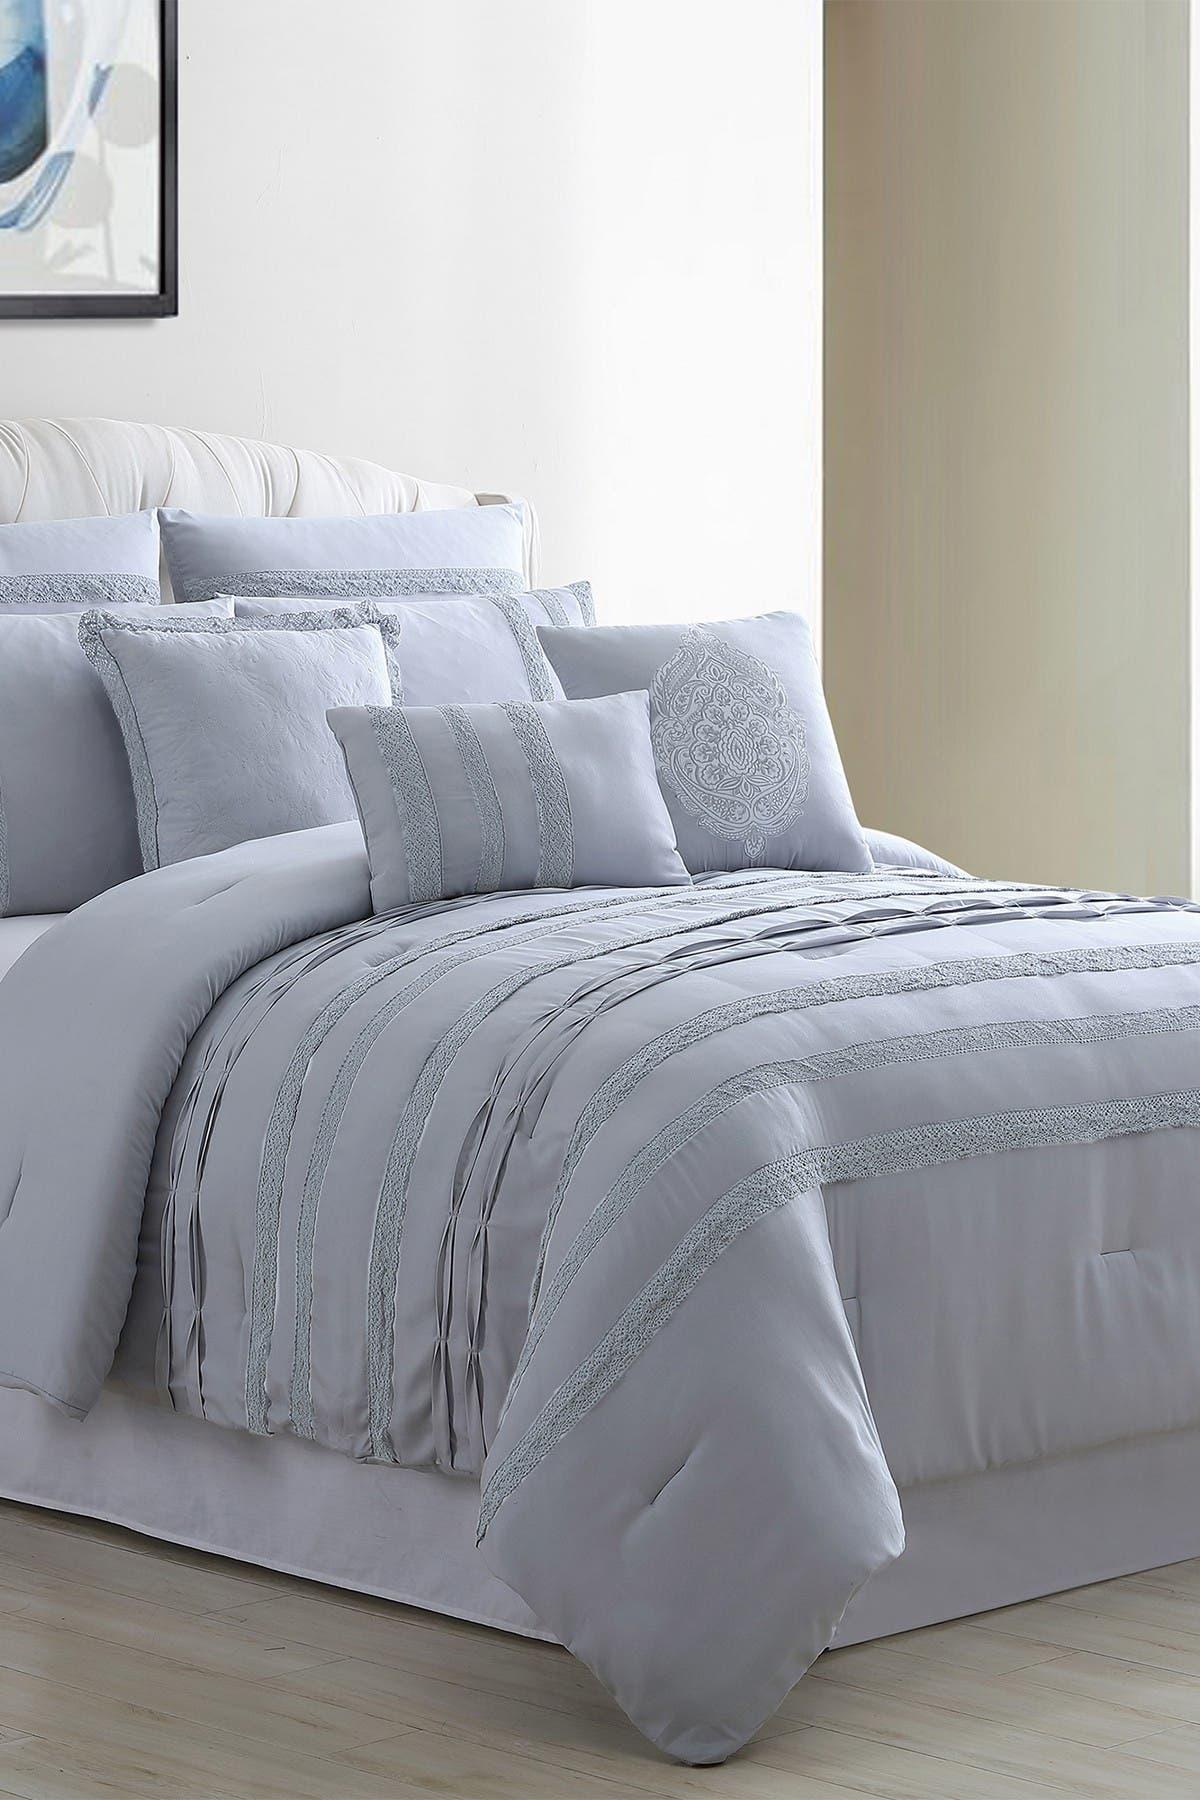 Image of Modern Threads Macarena 8-Piece King/Cal King Embellished Comforter Set - Grey